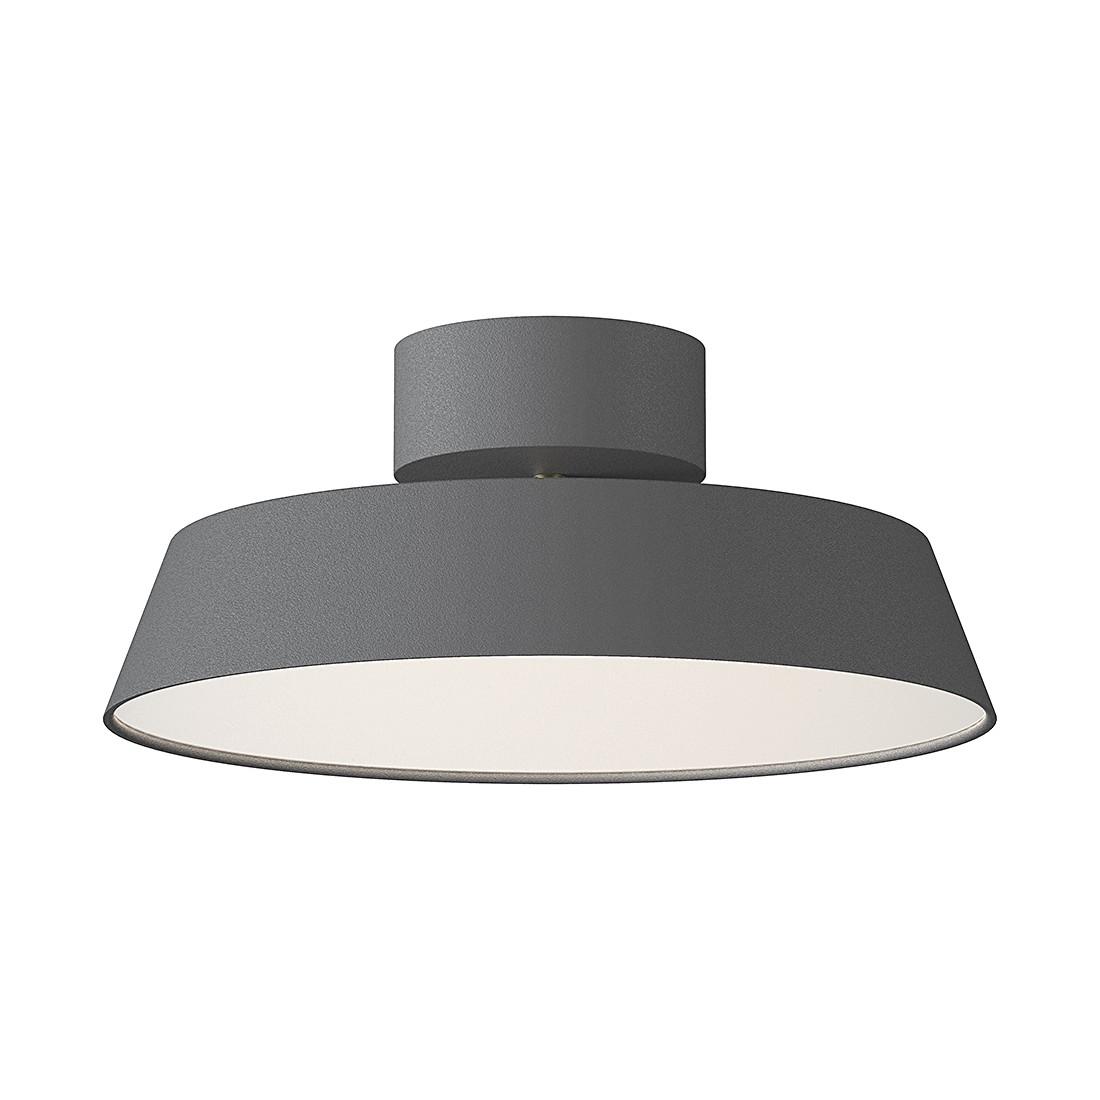 energie  A+, Plafondlamp Alba - 1 lichtbron, Nordlux